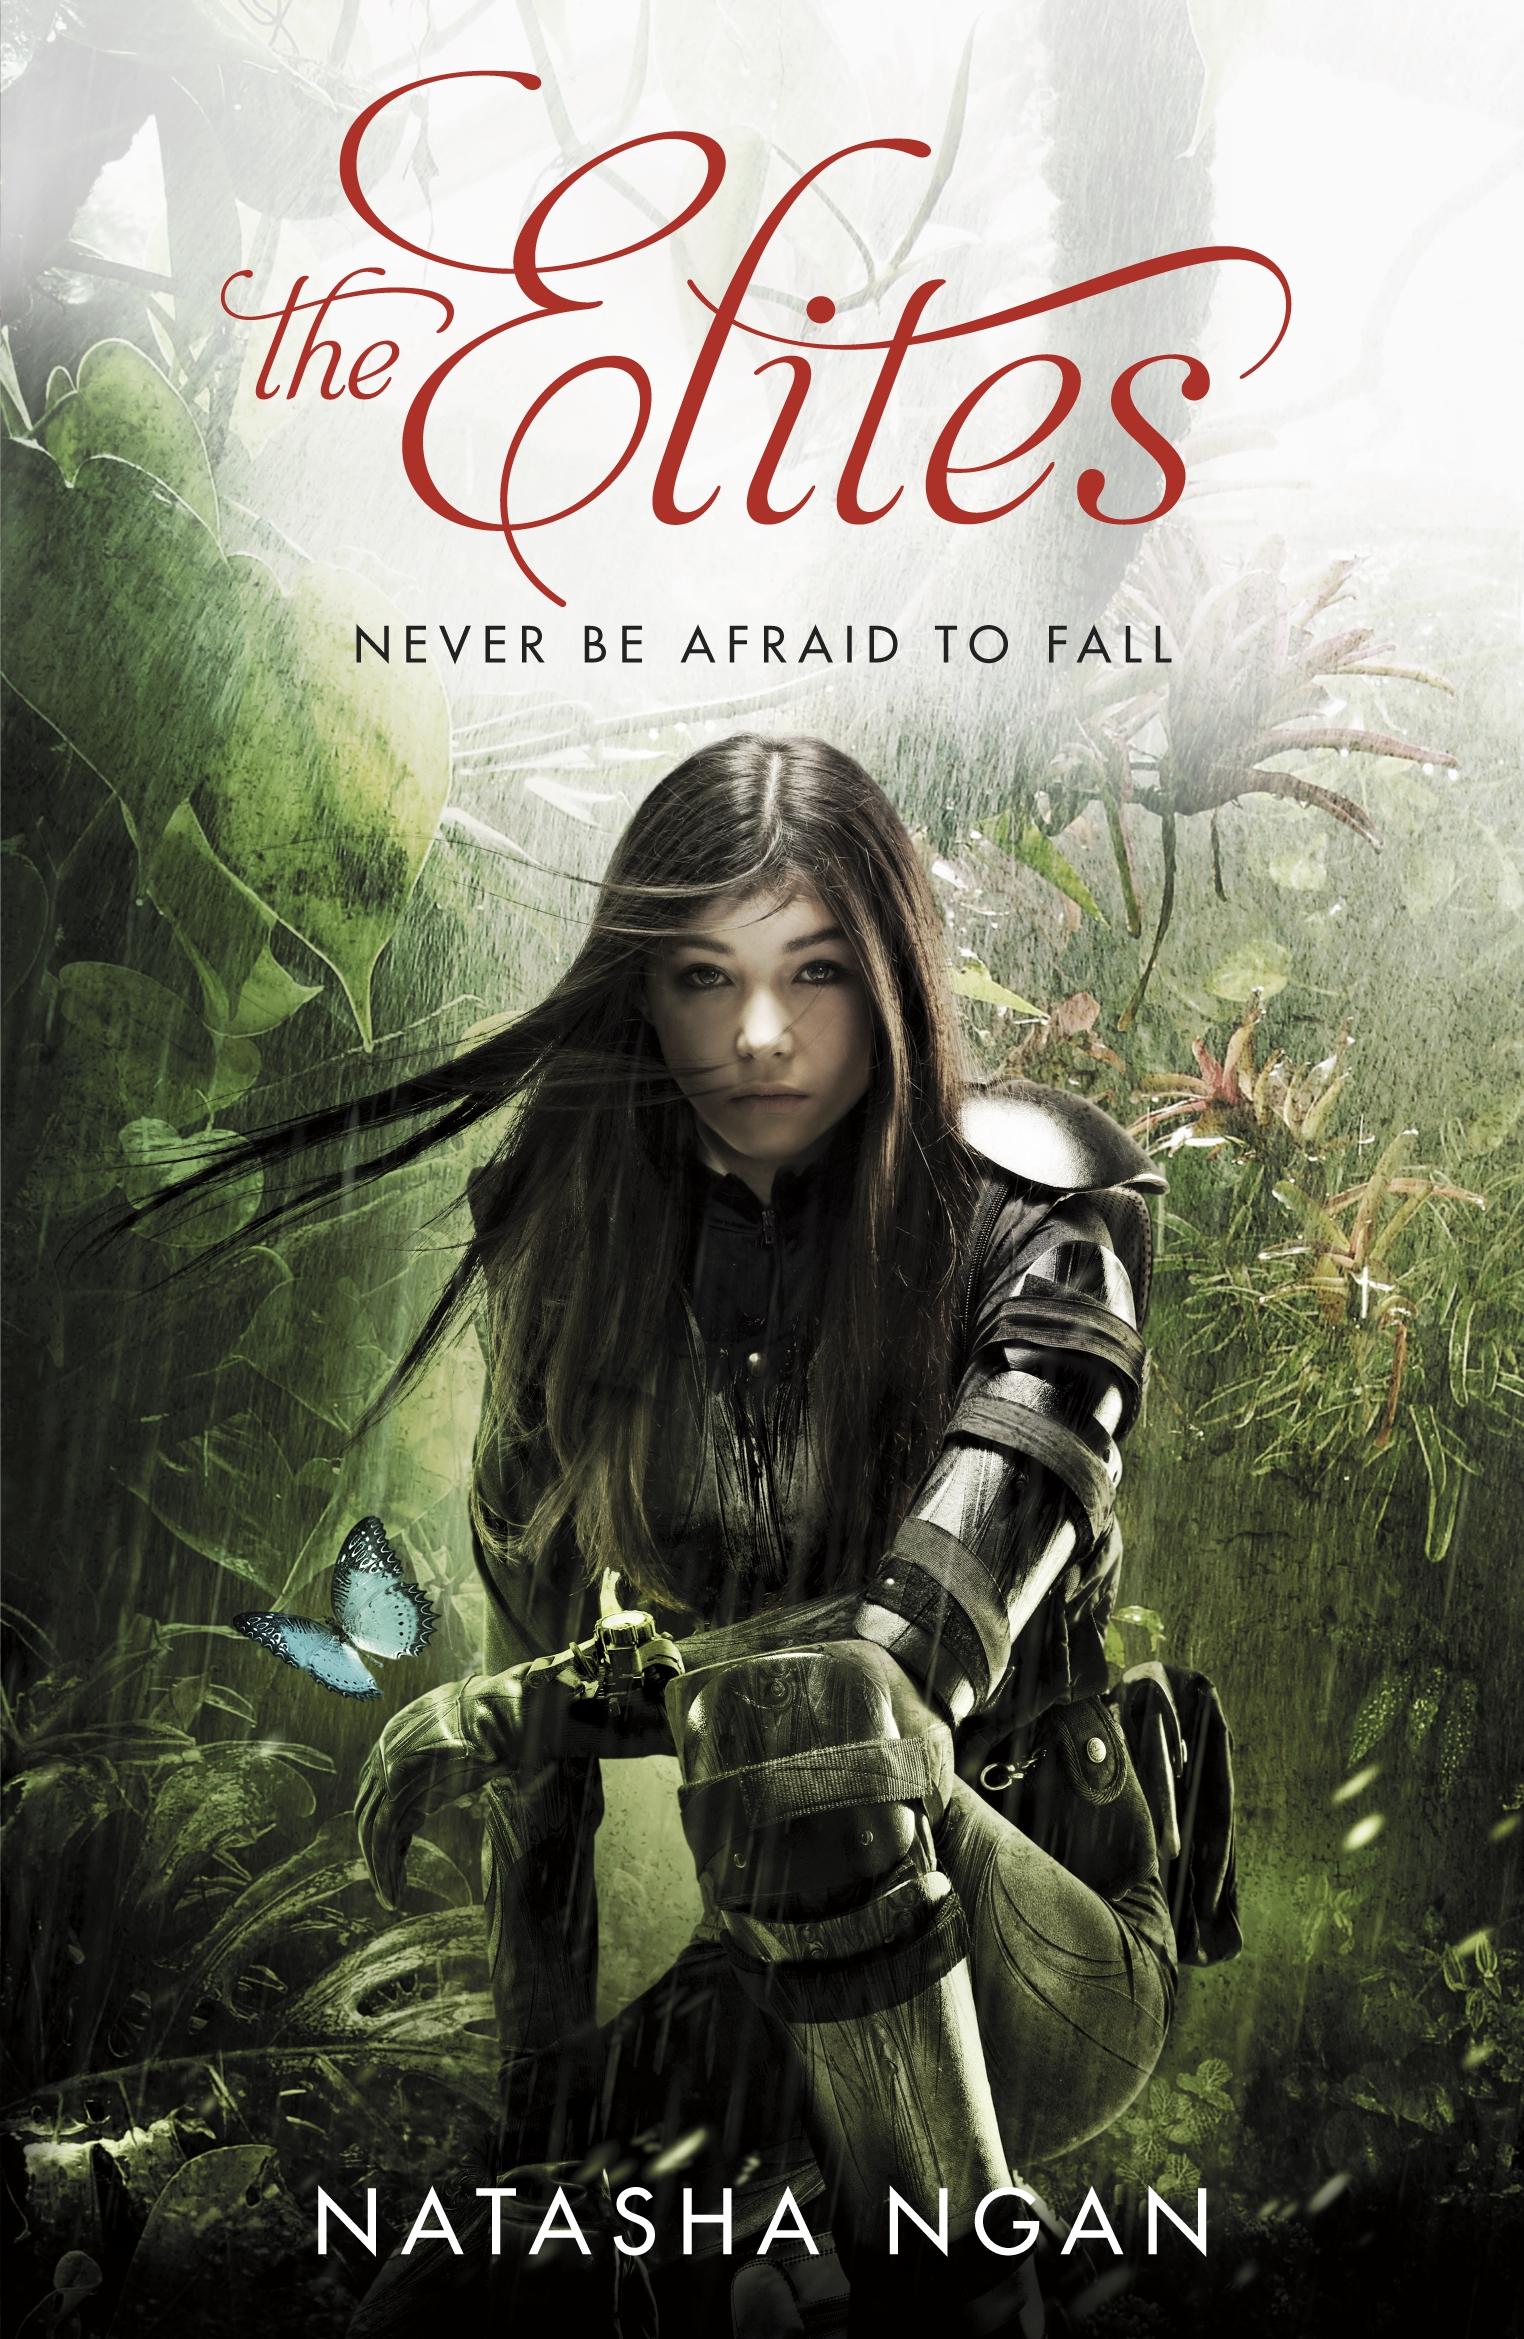 THE ELITES by Natasha Ngan UK Commonwealth paperback cover